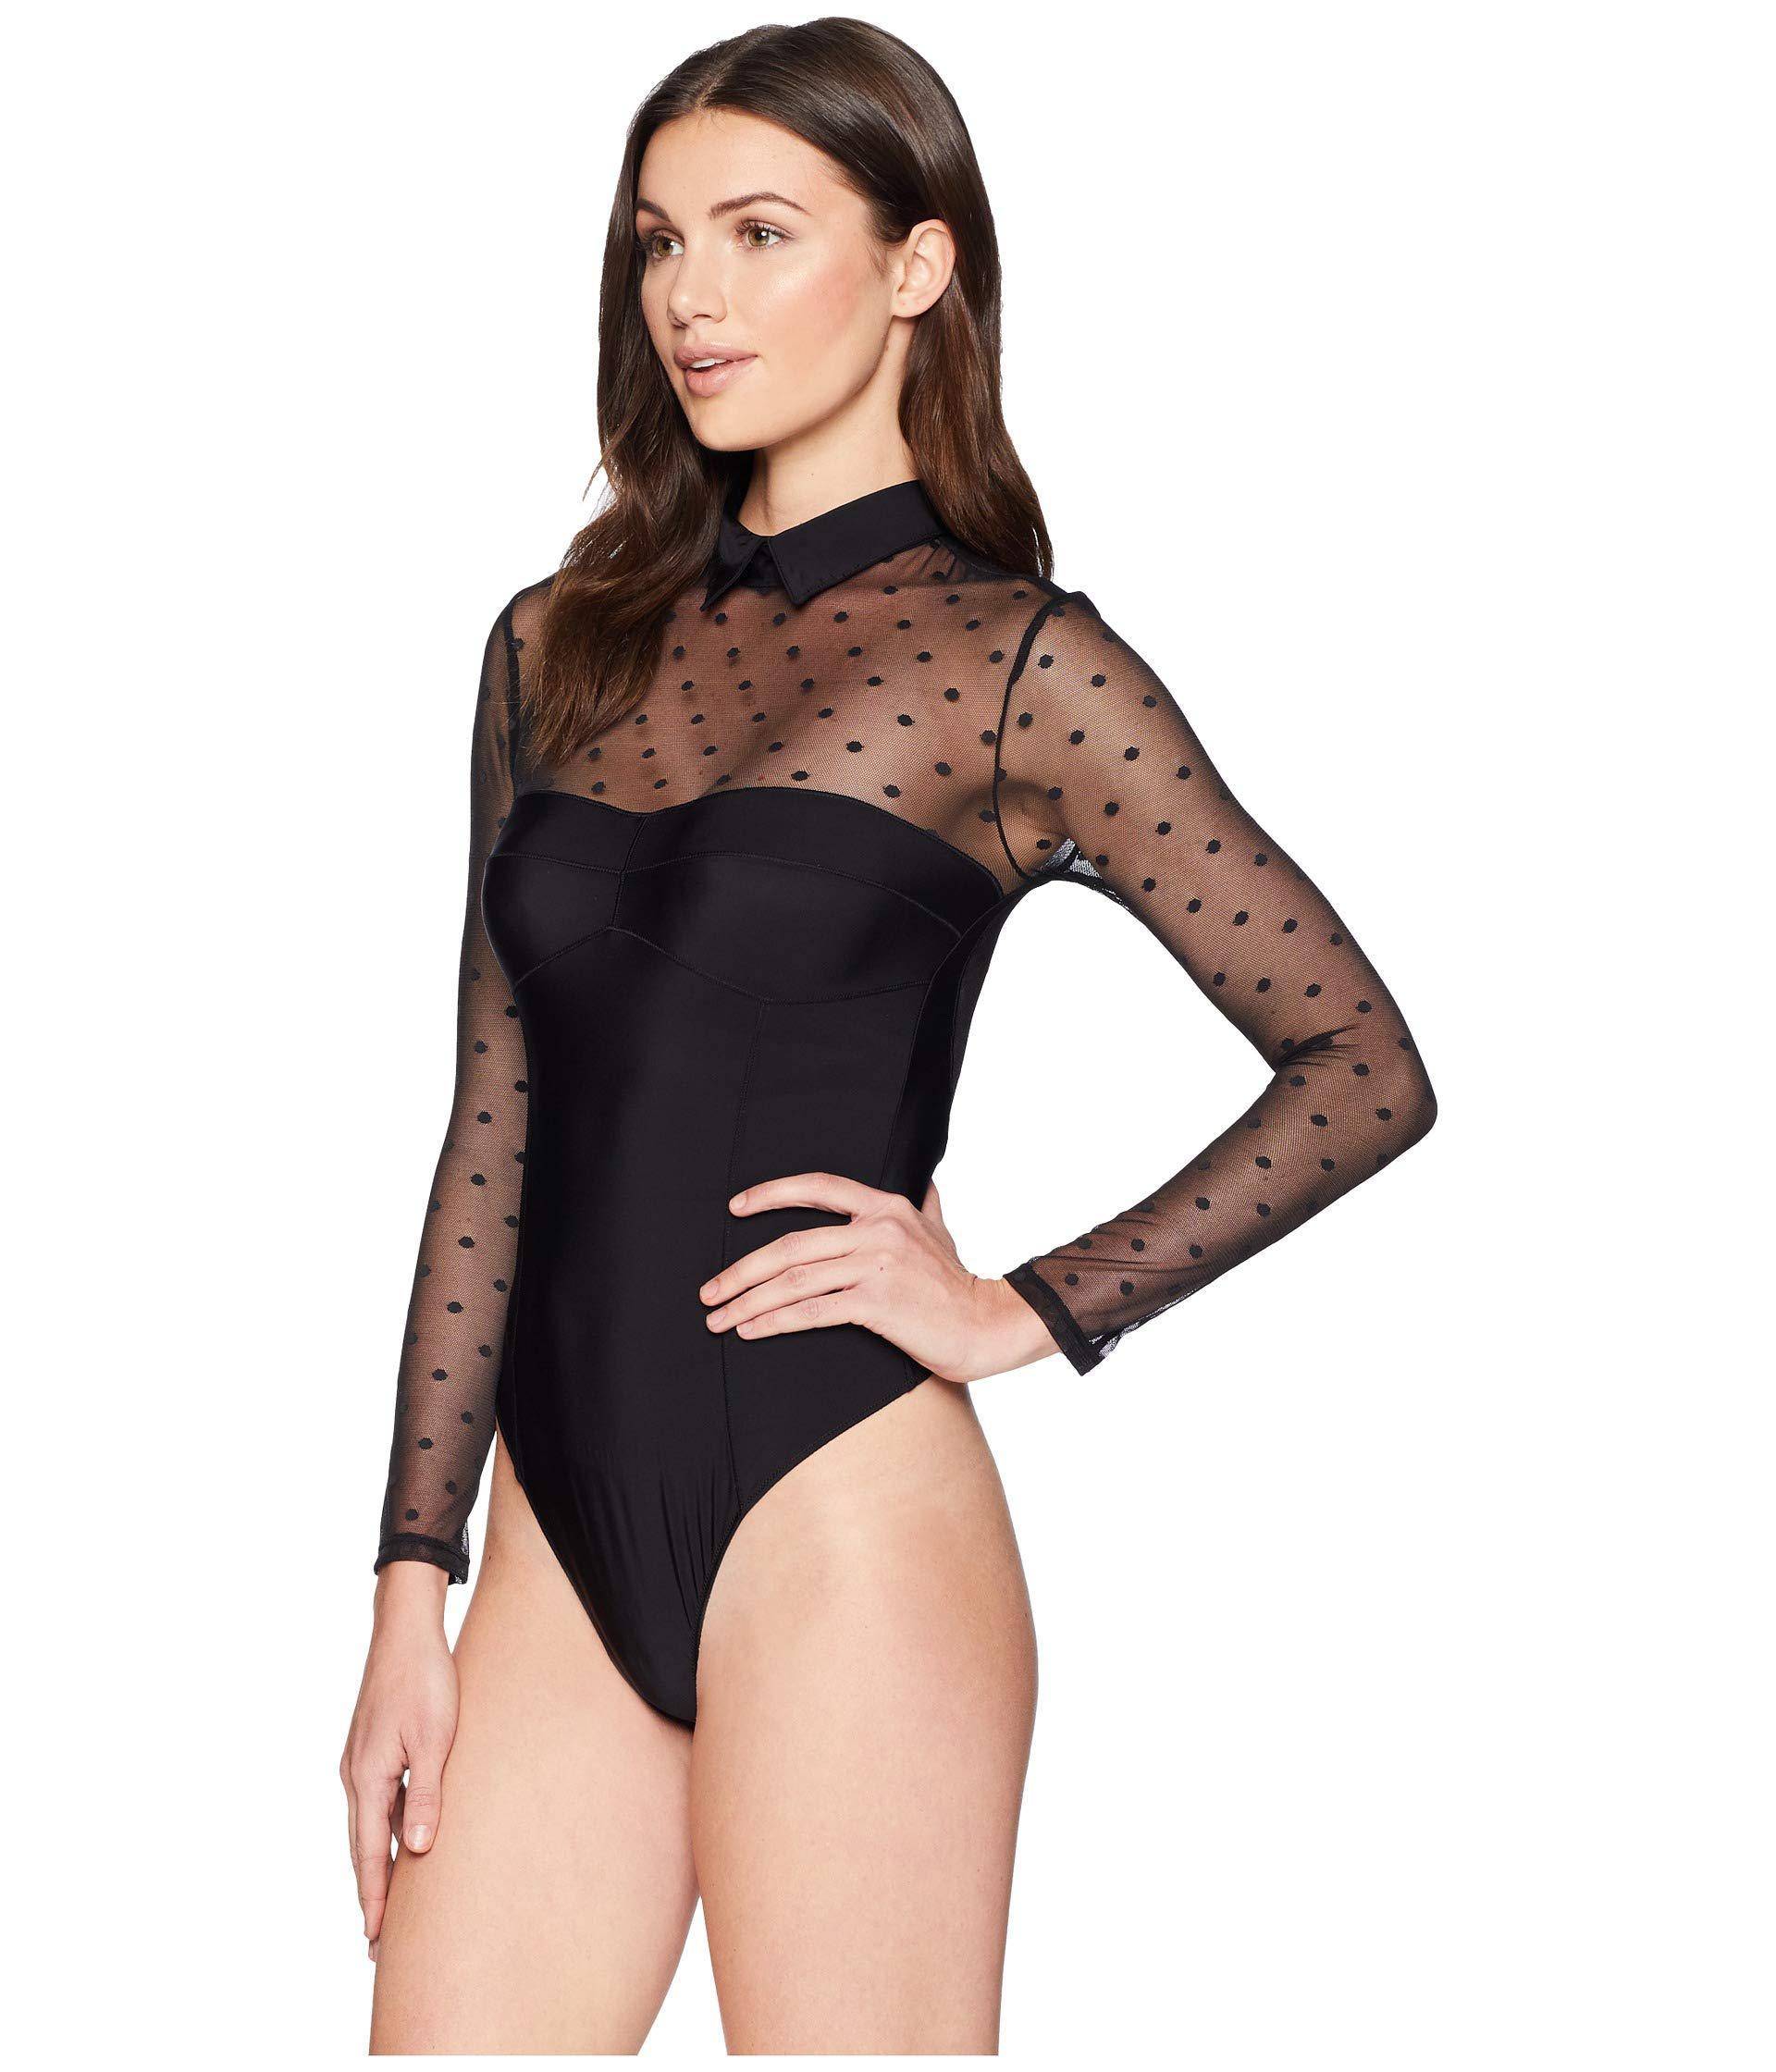 Lyst - Felina Belinda Point D esprit Thong Bodysuit in Black e28458c77